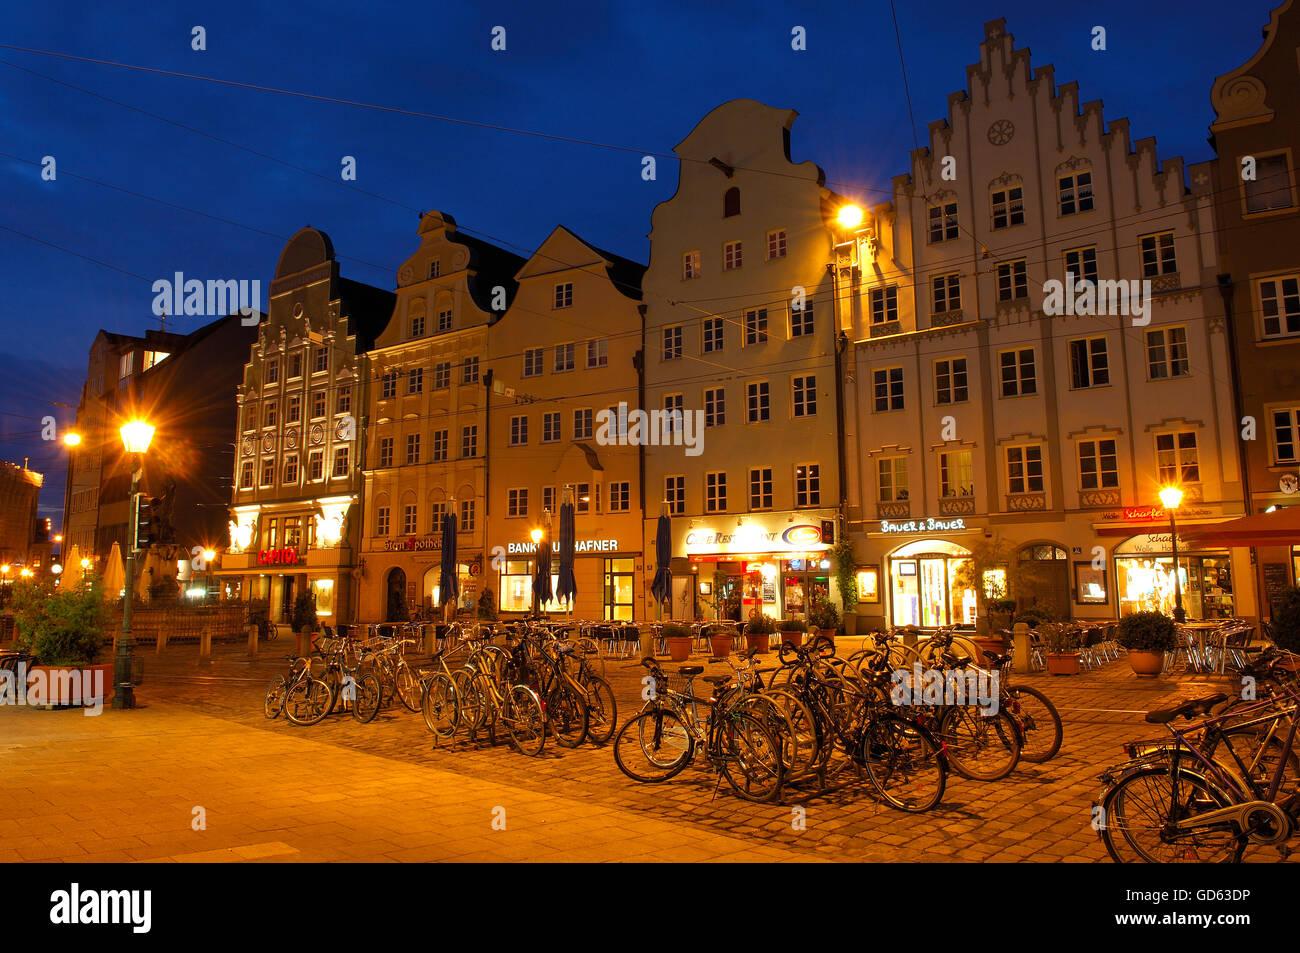 Augsburg, Maximilianstraße, Maximilianstraße, romantische Straße, Romantische Strasse, Schwaben, Stockbild